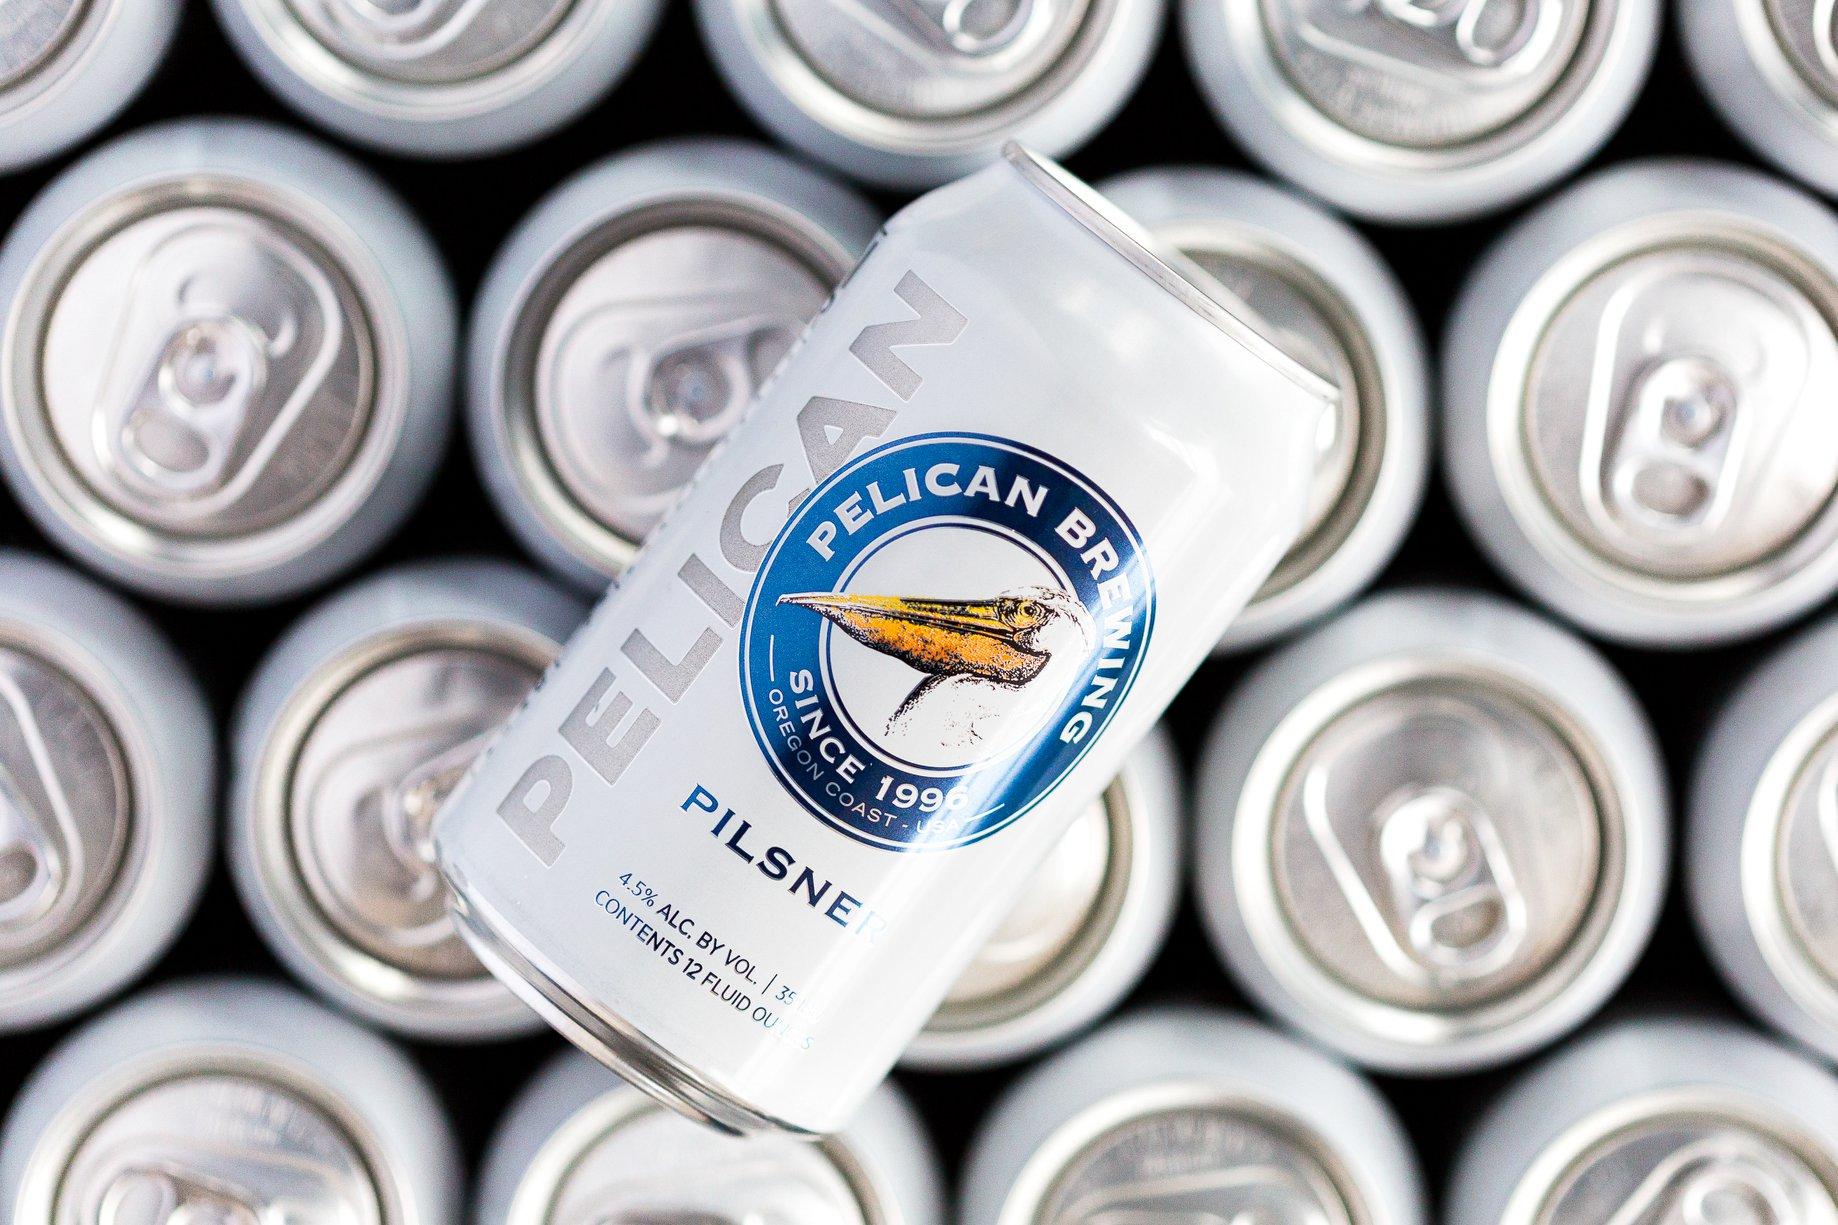 image of Pelican Pilsner courtesy of Pelican Brewing Co.